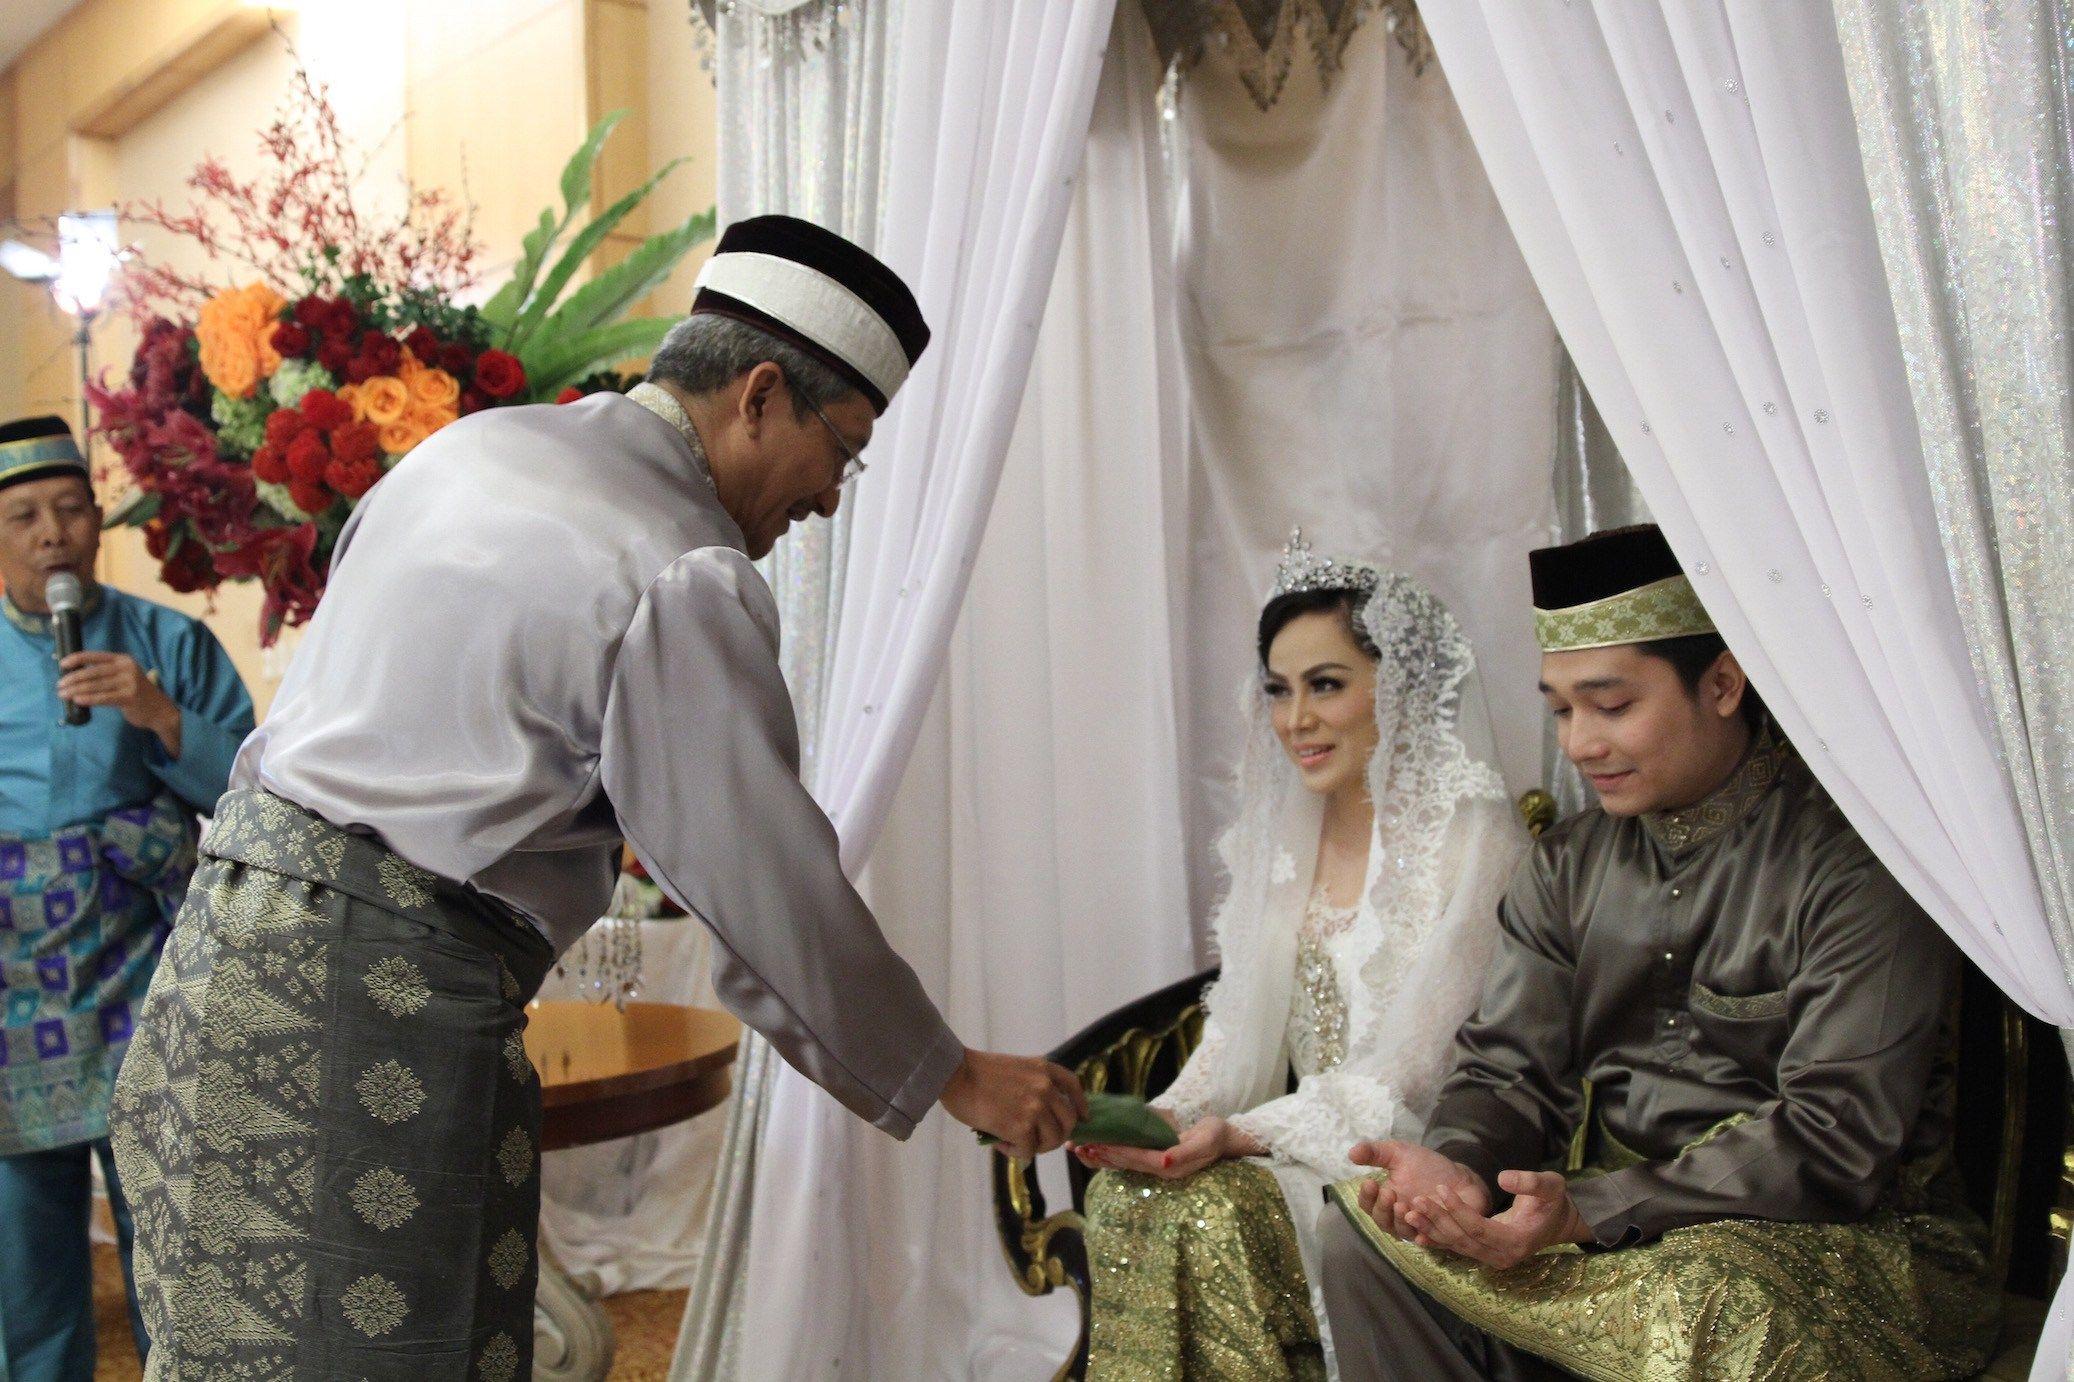 Pernikahan Adat Melayu Deli Nina Dan Zakie Tepungtawar Rias Chocker Slice Top Blouse Baju Atasan Wanita Bl899 Palembang